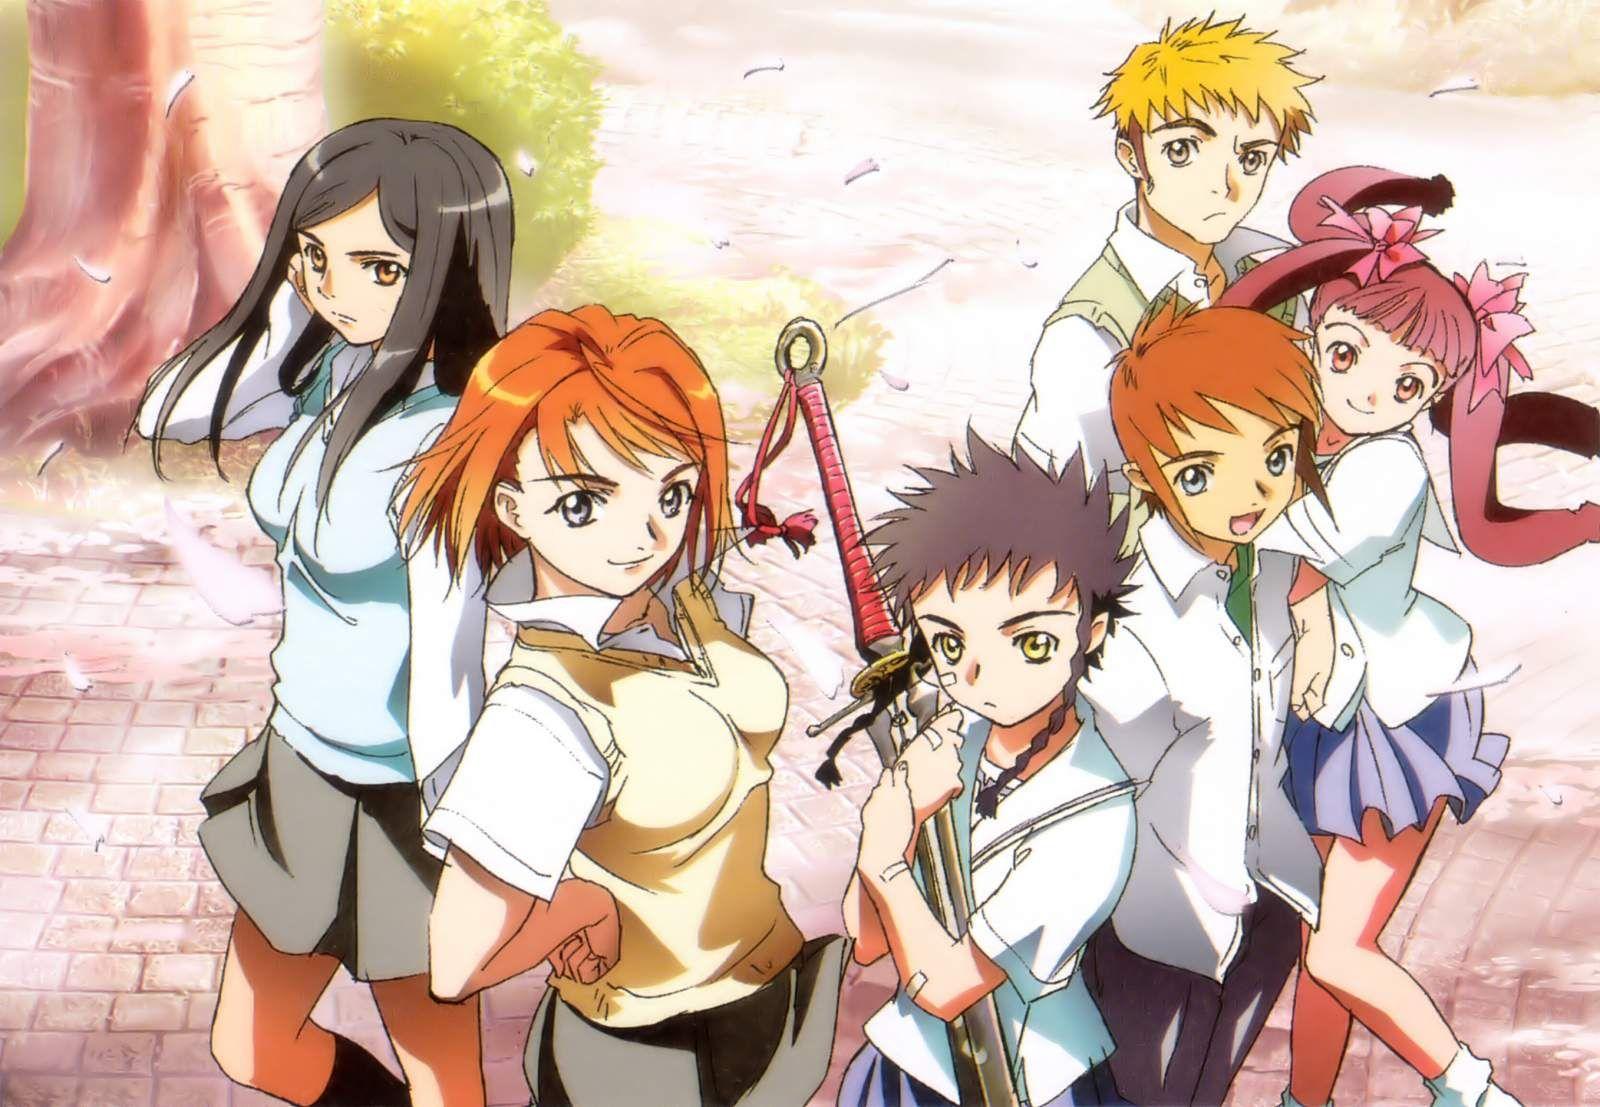 10 Anime Like Soul Eater My hime, Anime, Anime shows